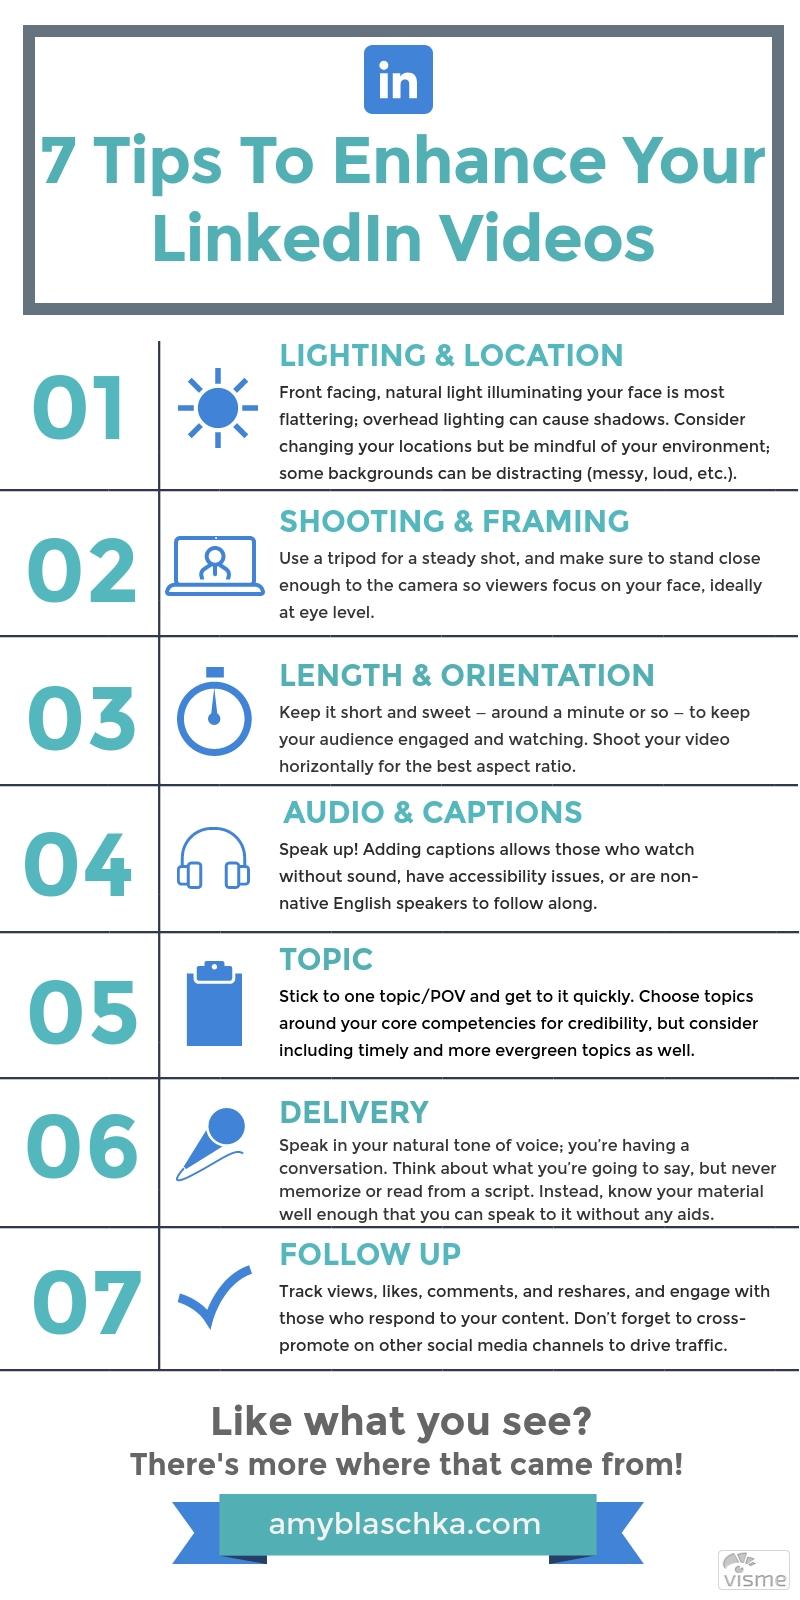 7-Tips-to-Enhance-Your-LinkedIn-Videos.jpg